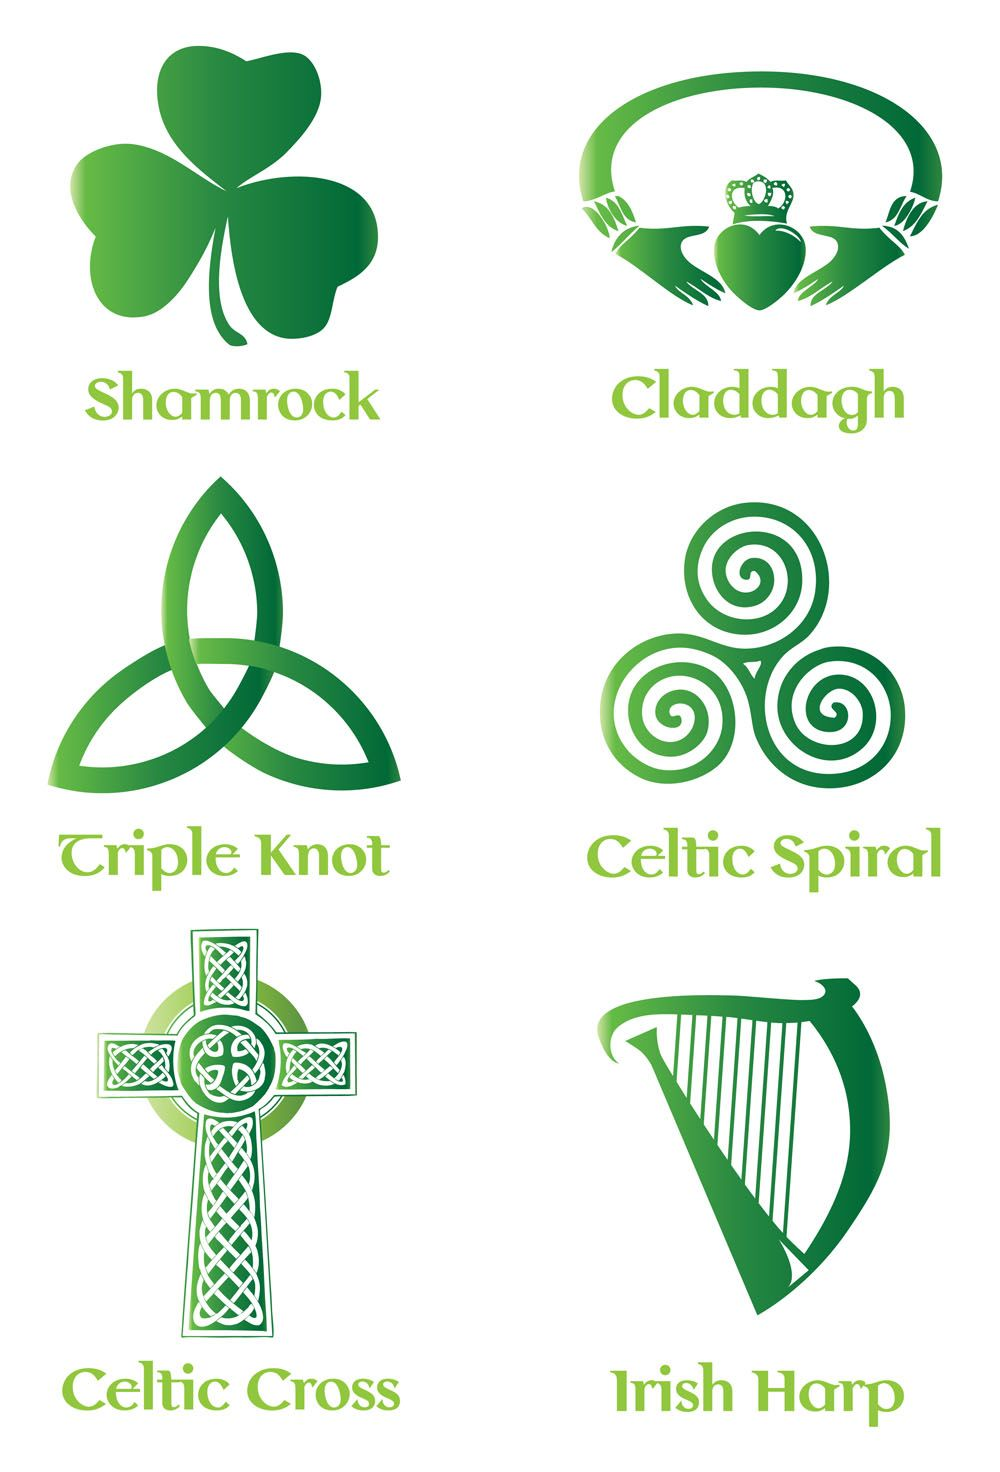 Irish celtic symbol vector set backgrounds buttons patterns free irish celtic symbol vector set backgrounds buttons patterns free childrens theater pinterest irish celtic symbols and celtic tattoos biocorpaavc